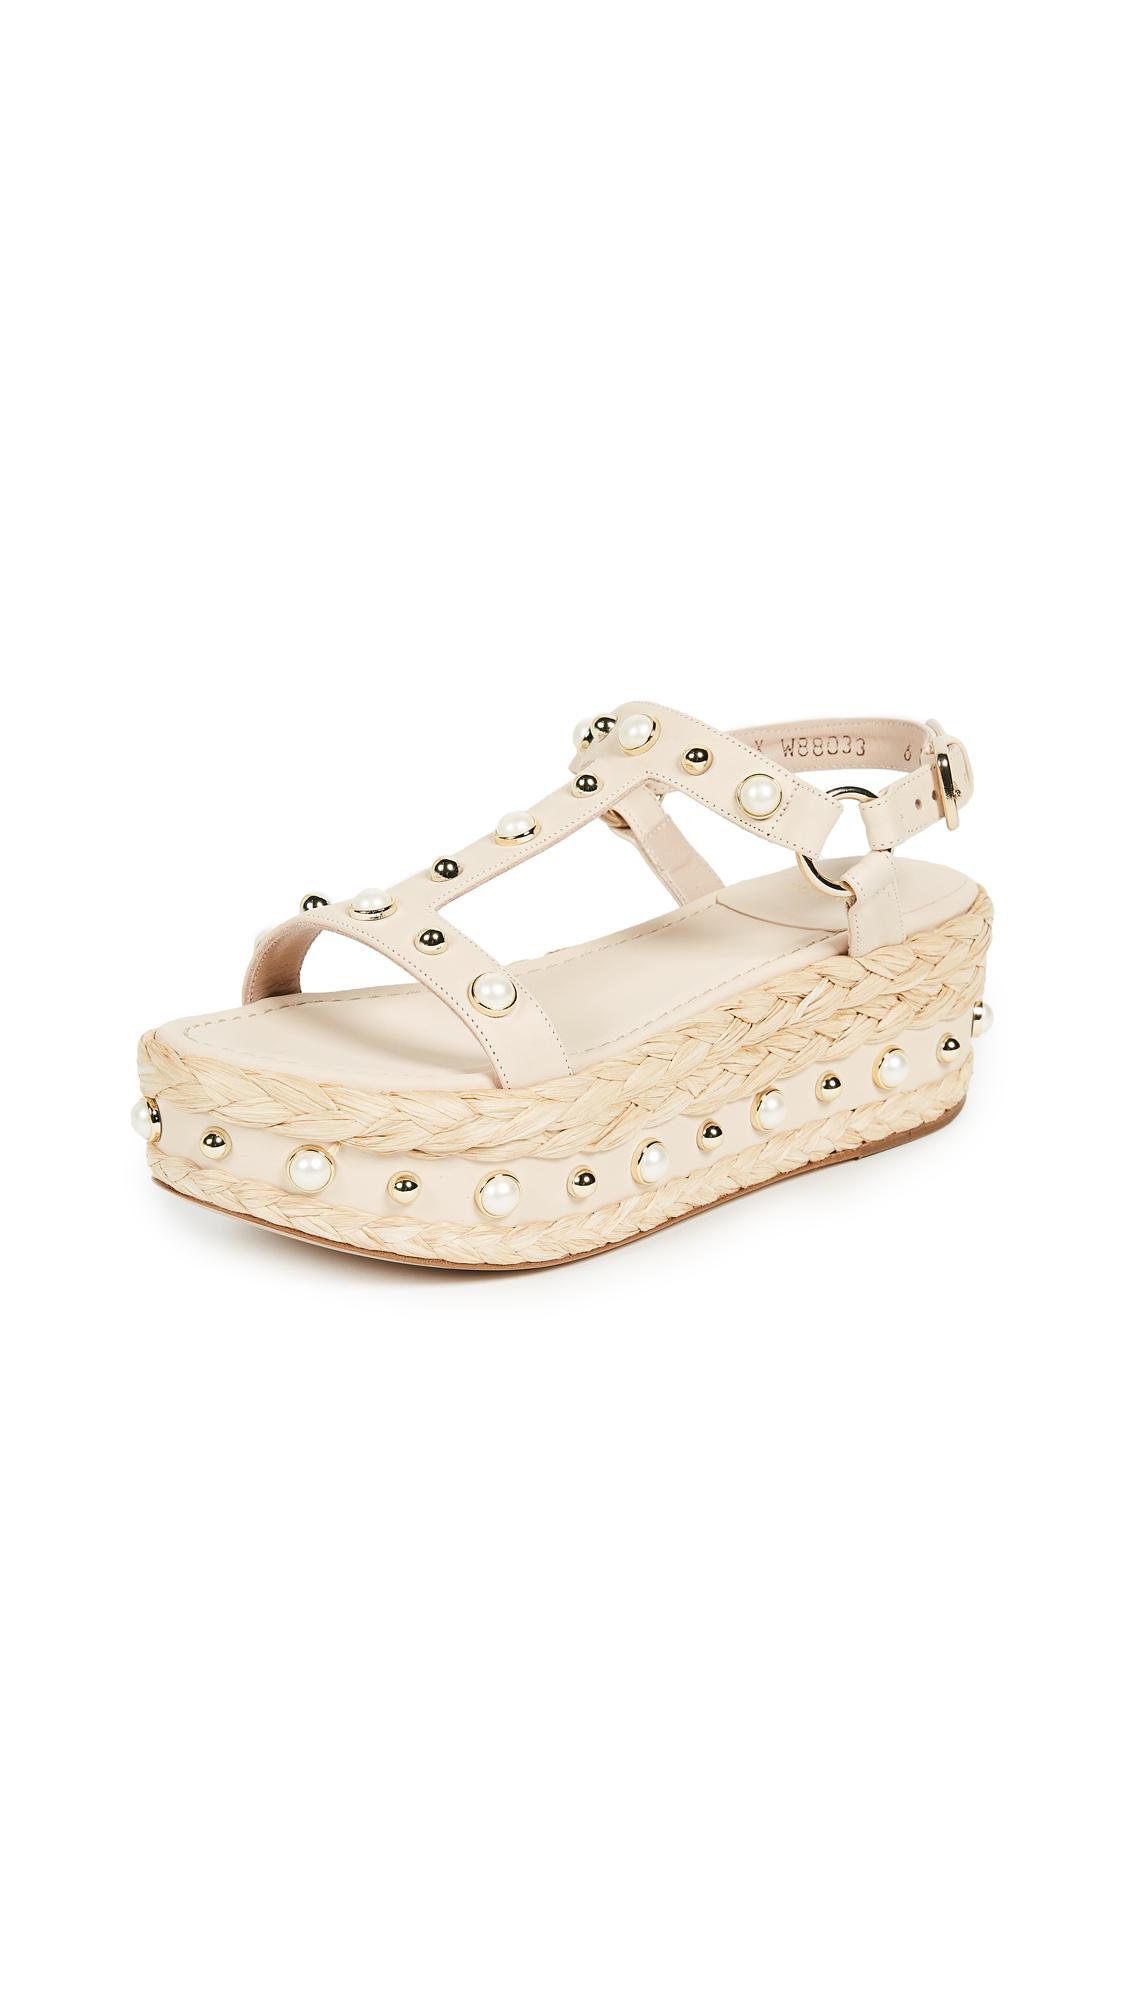 Stuart Weitzman Be Raffia Flatform Sandals - Pan